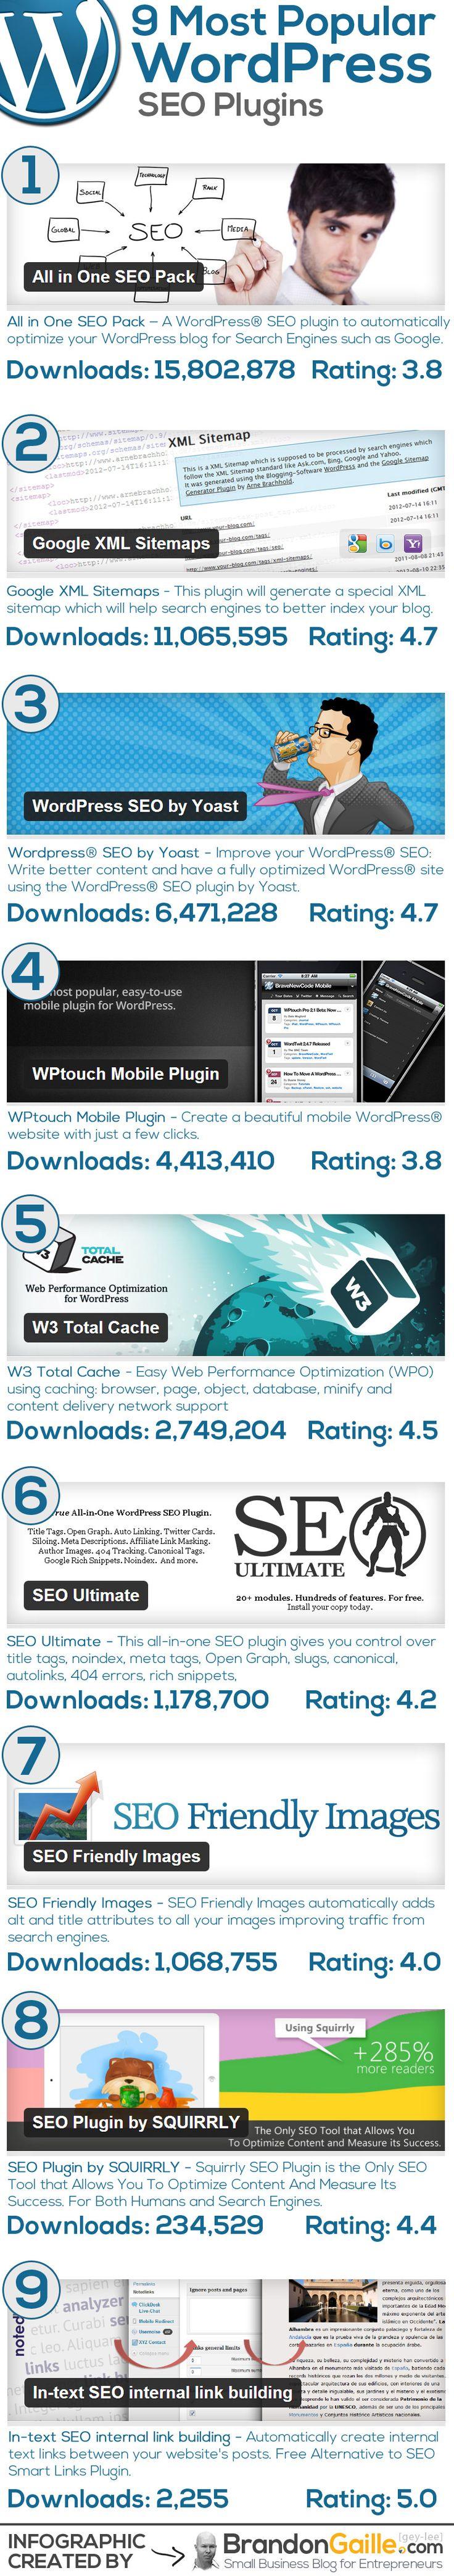 9 Best WordPress SEO Plugins